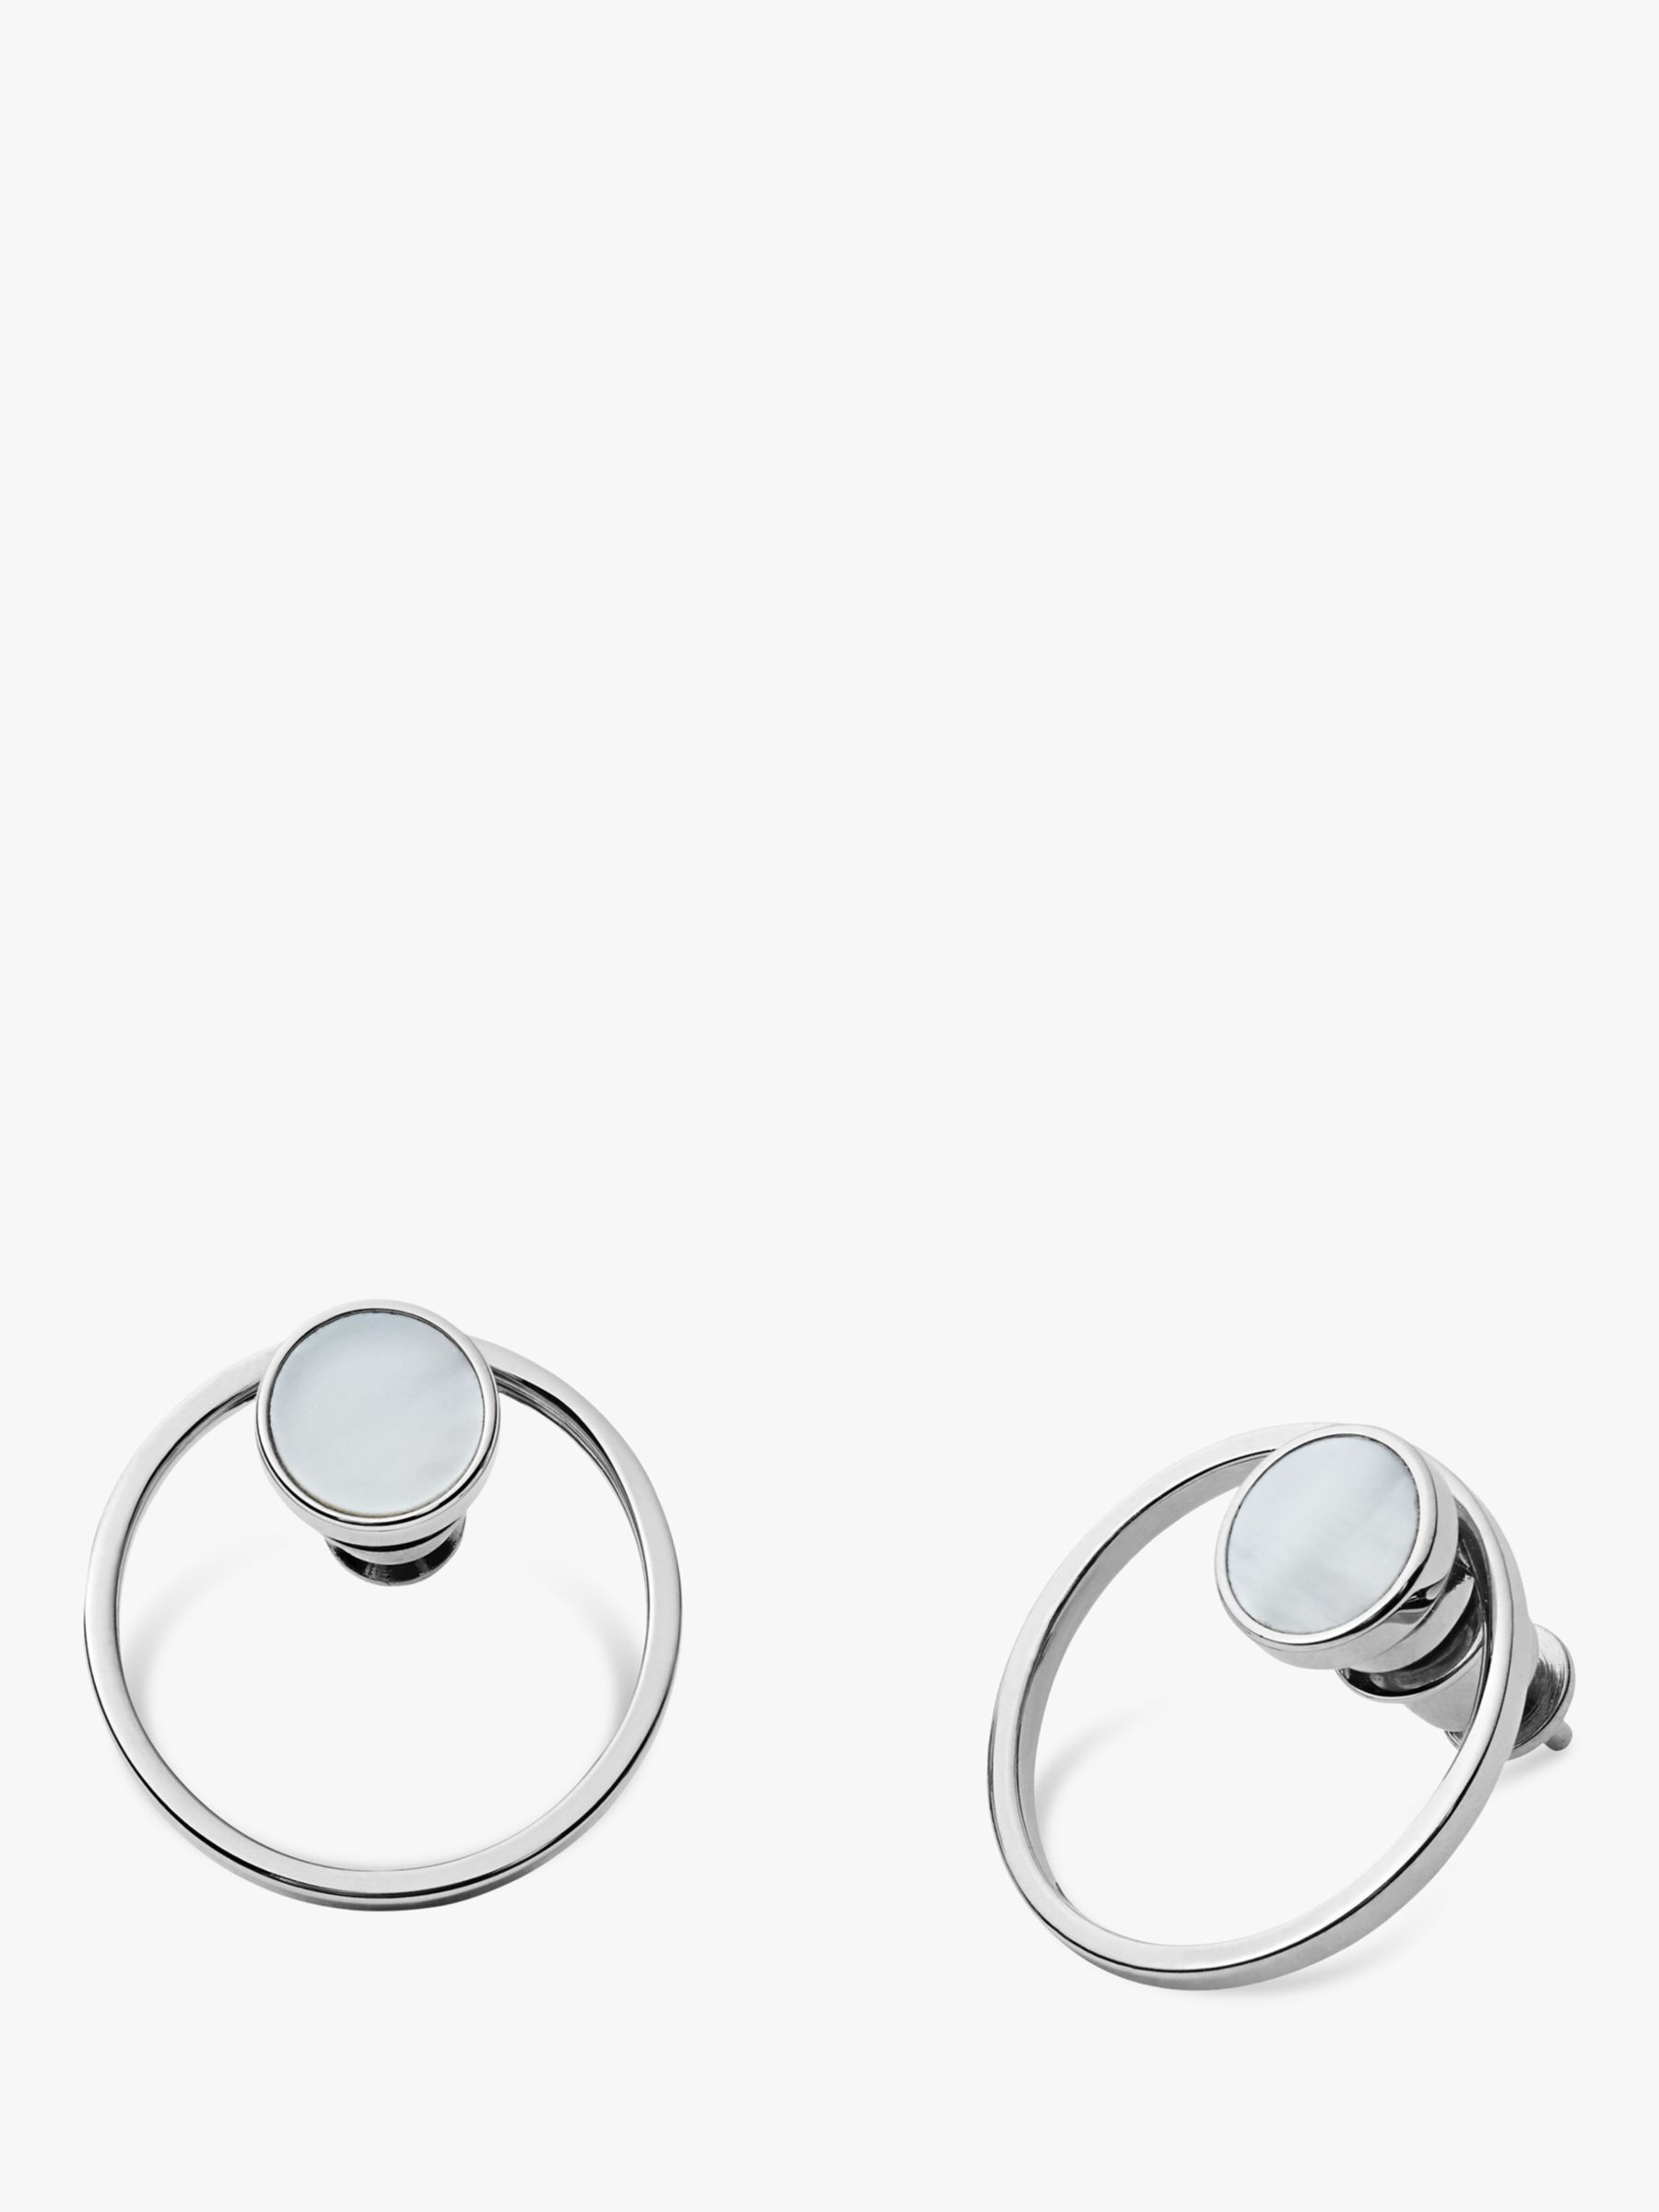 skagen Skagen Agnethe Cut Out Mother of Pearl Round Stud Earrings, Silver/White SKJ1096040